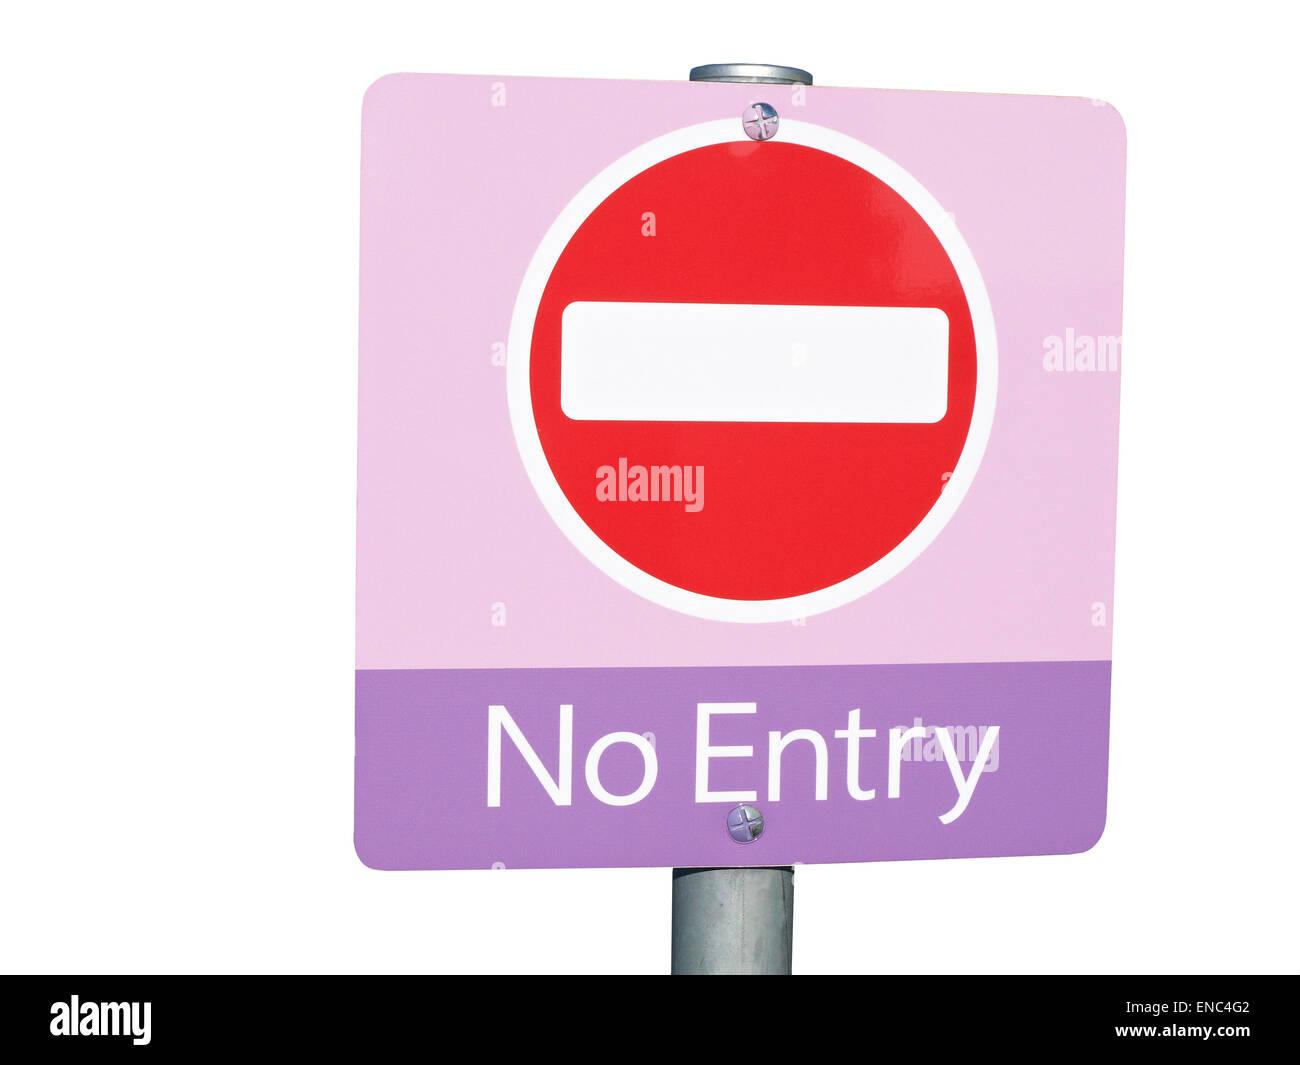 No Entry sign UK - Stock Image